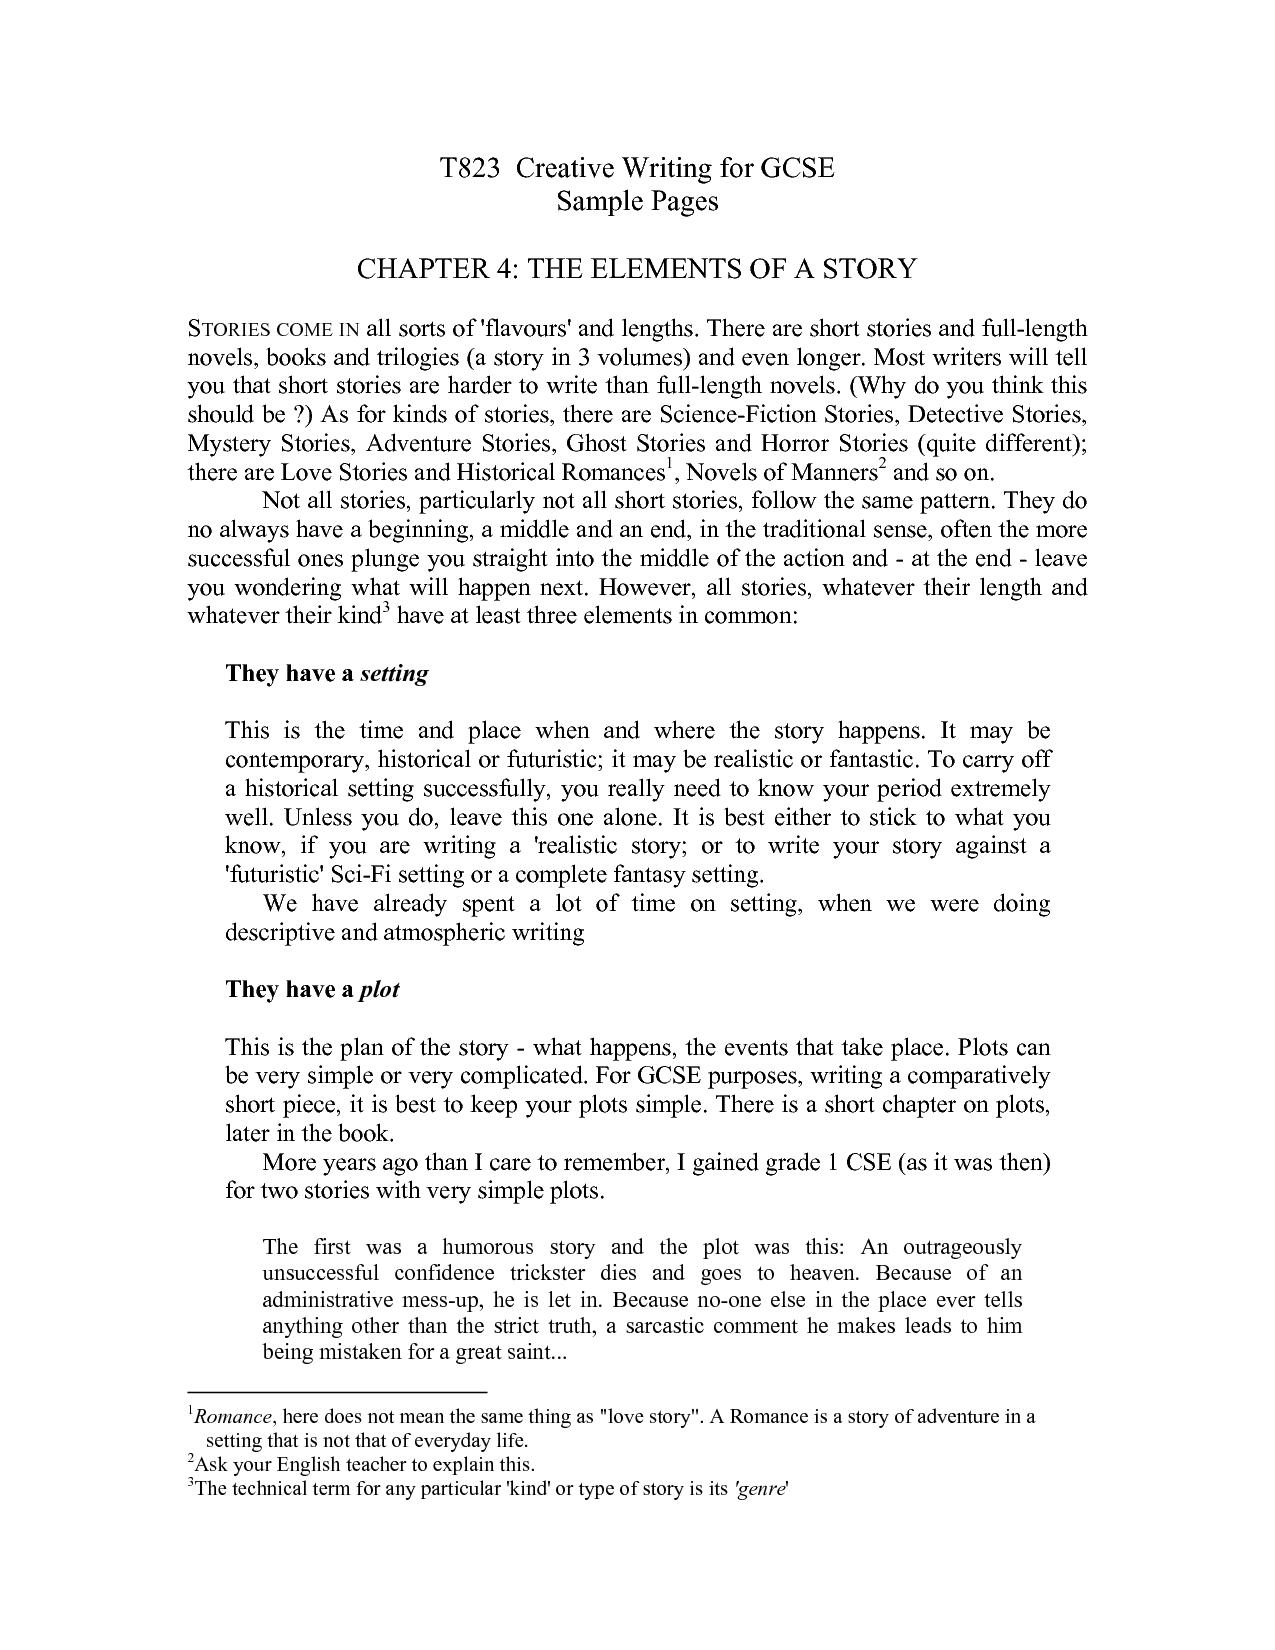 018 Essay Example Narrative Unforgettable Samples Examples High School Format Interesting Spm Full